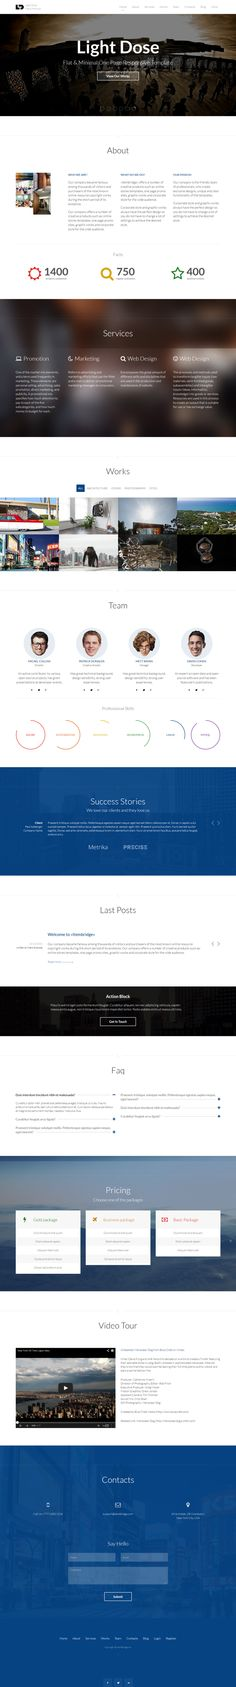 LightDose becomes WordPress Theme by ItemBridge , via Behance